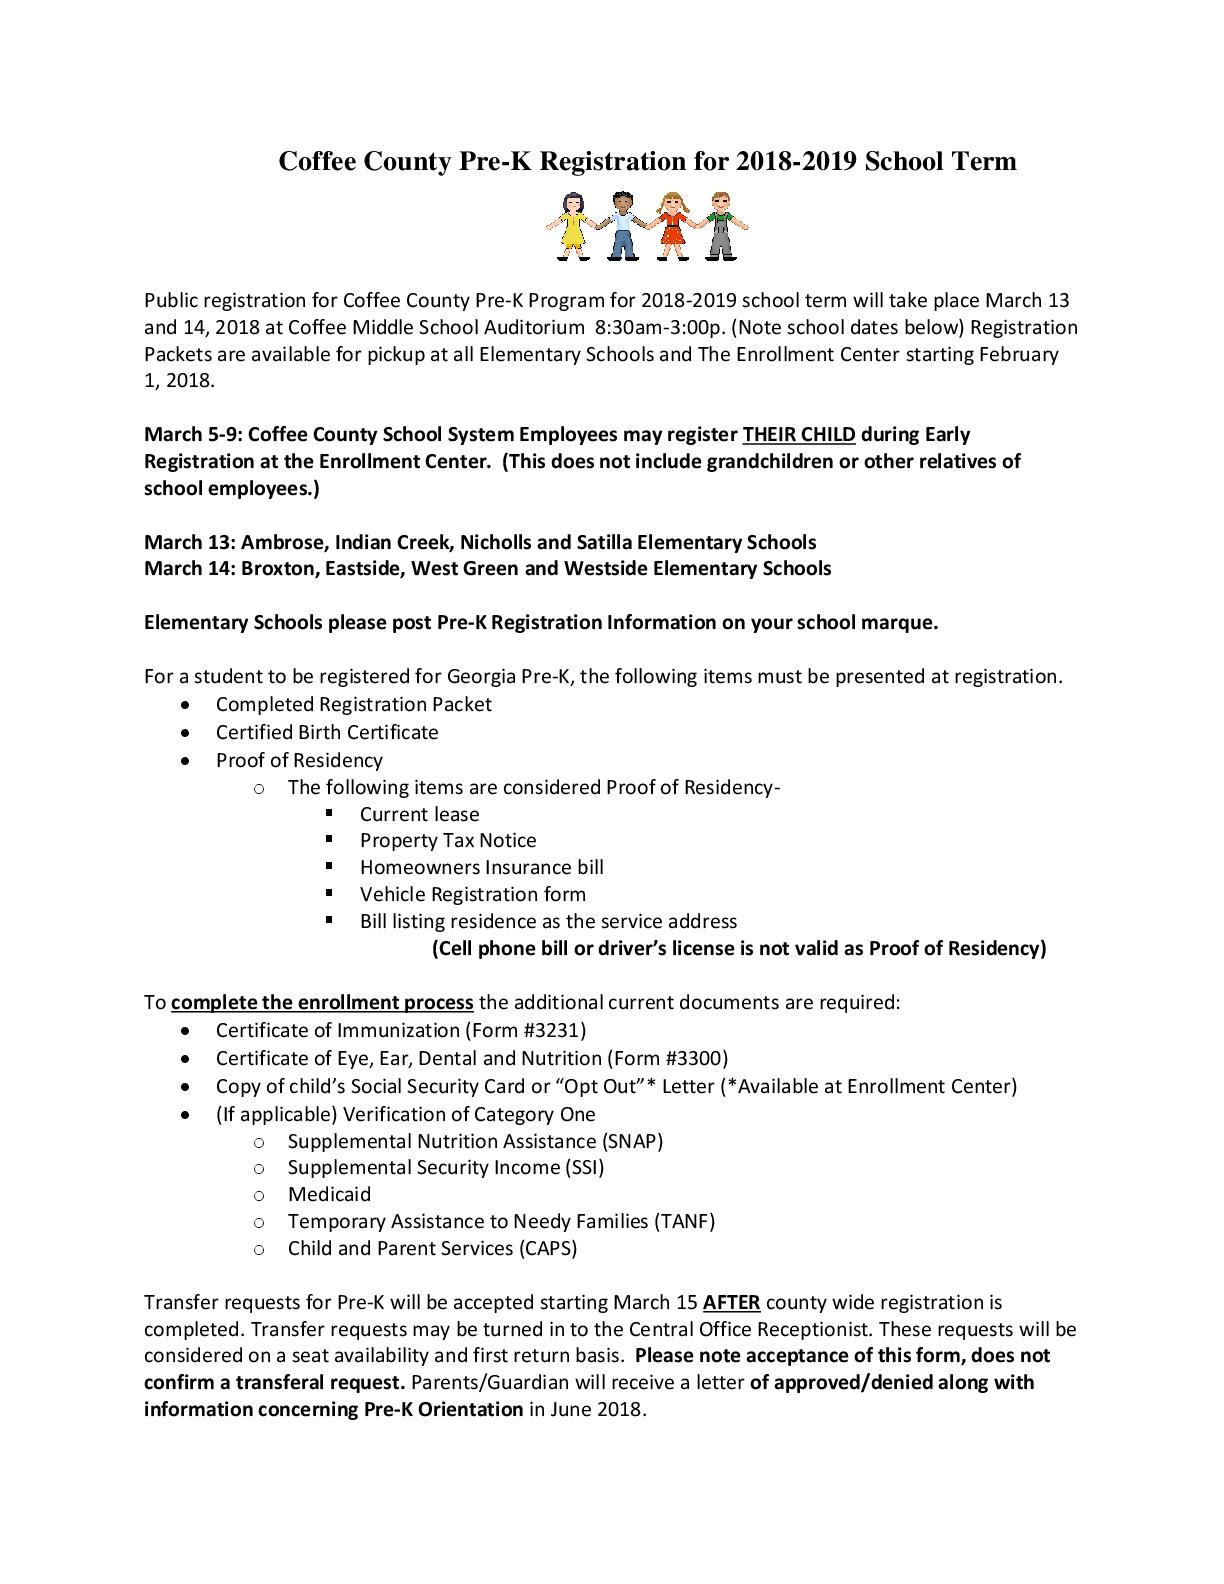 Indian creek elementary school highlights prek registration 2018 thecheapjerseys Gallery